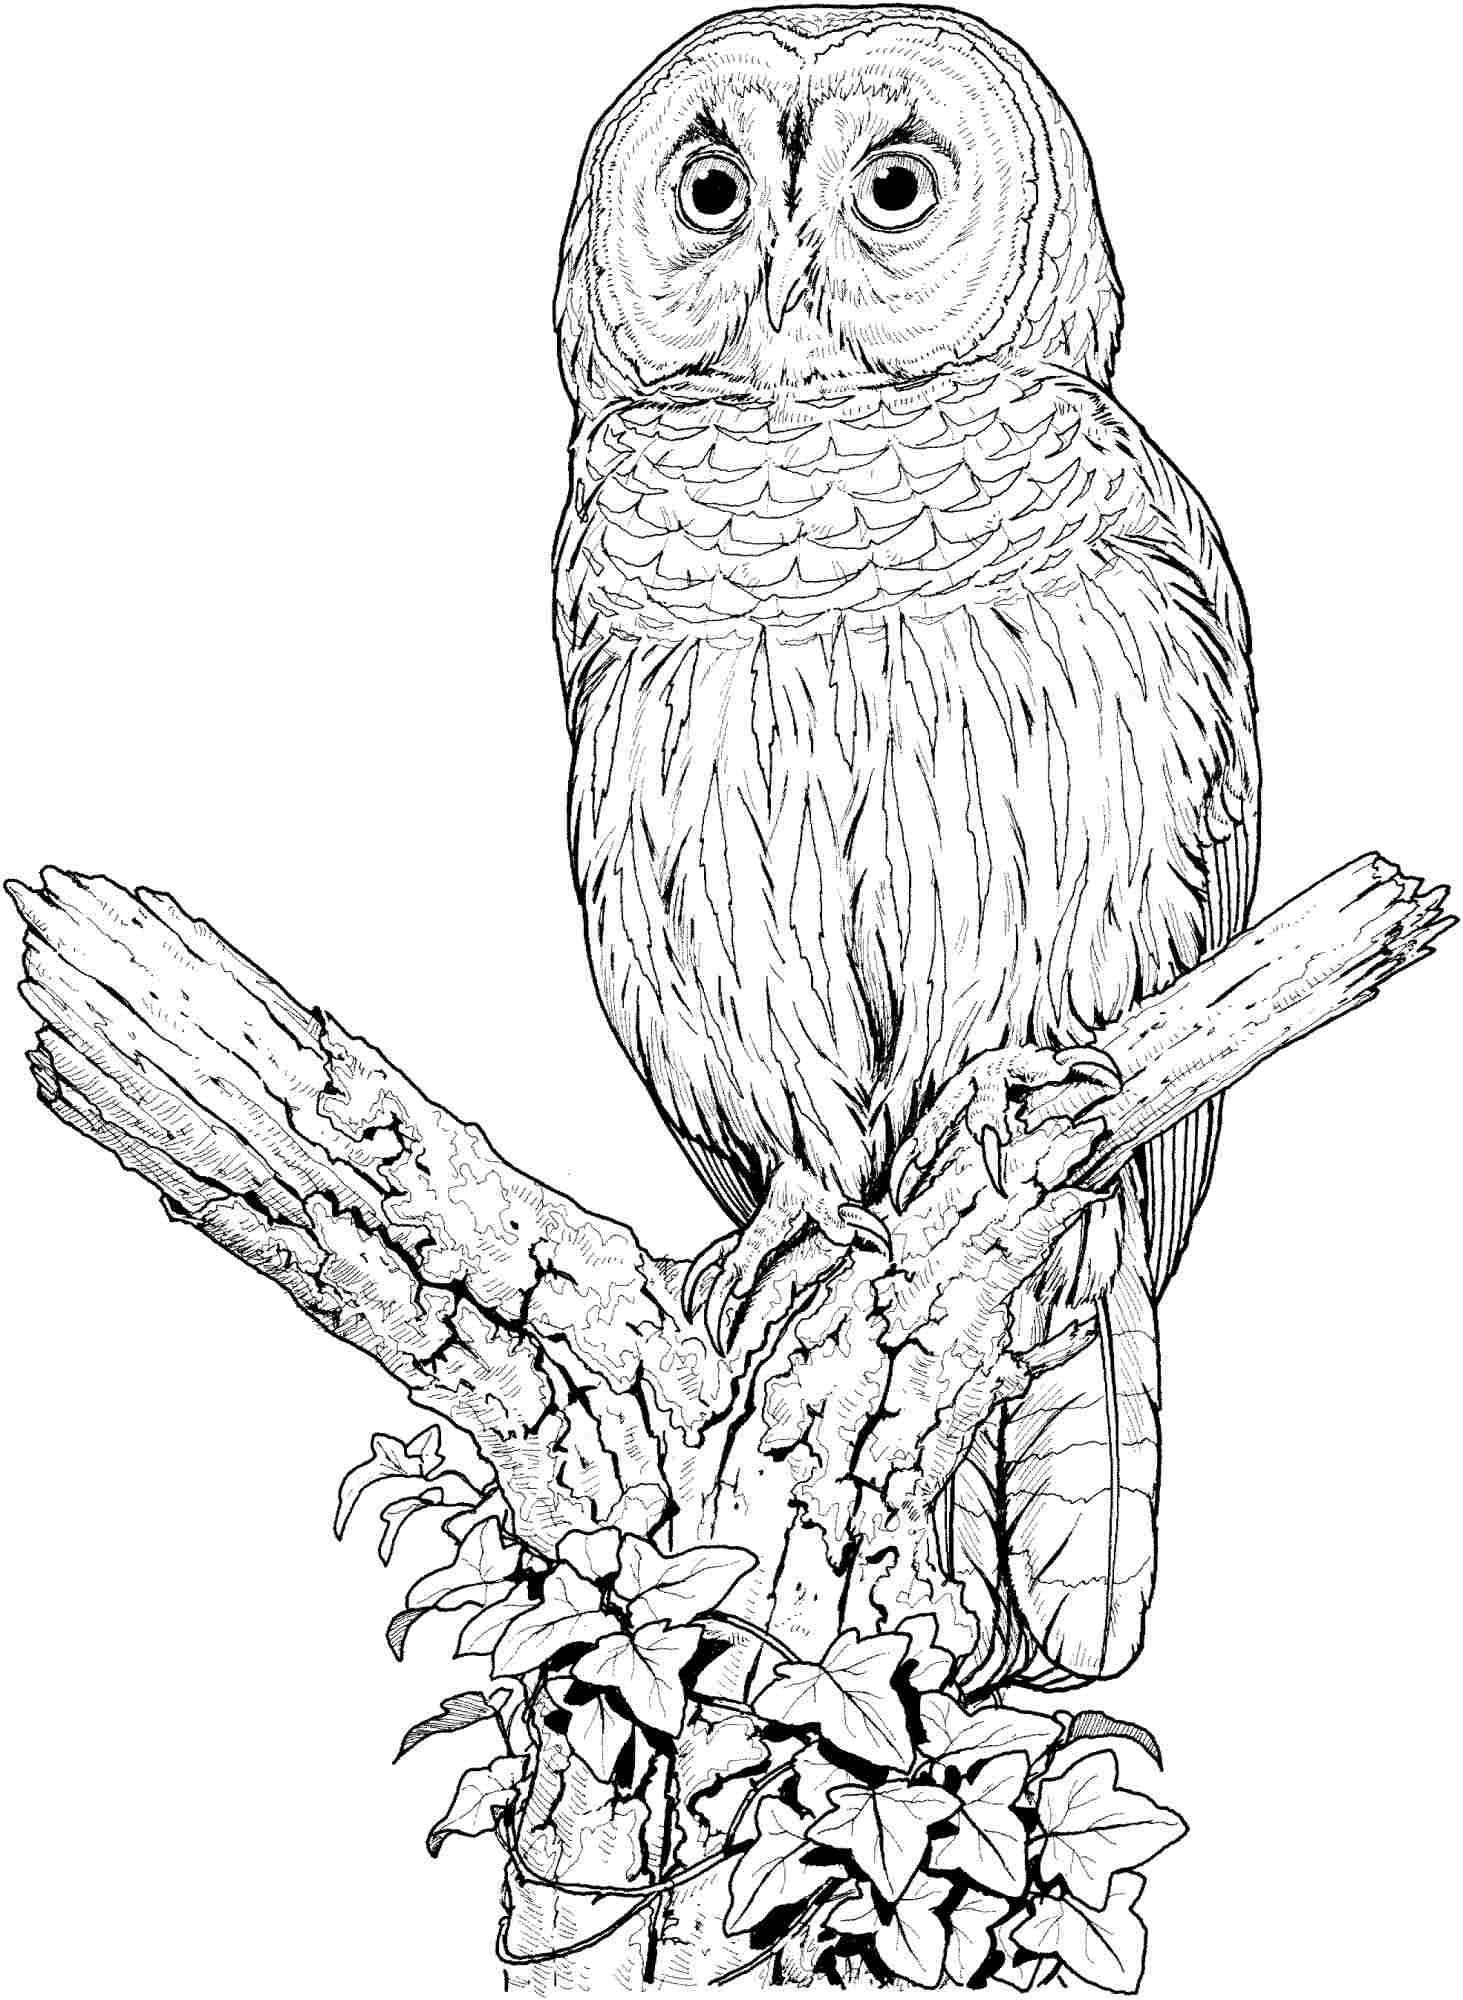 Colouring Sheets Animal Owl Free Printable For Preschool #8287 ...